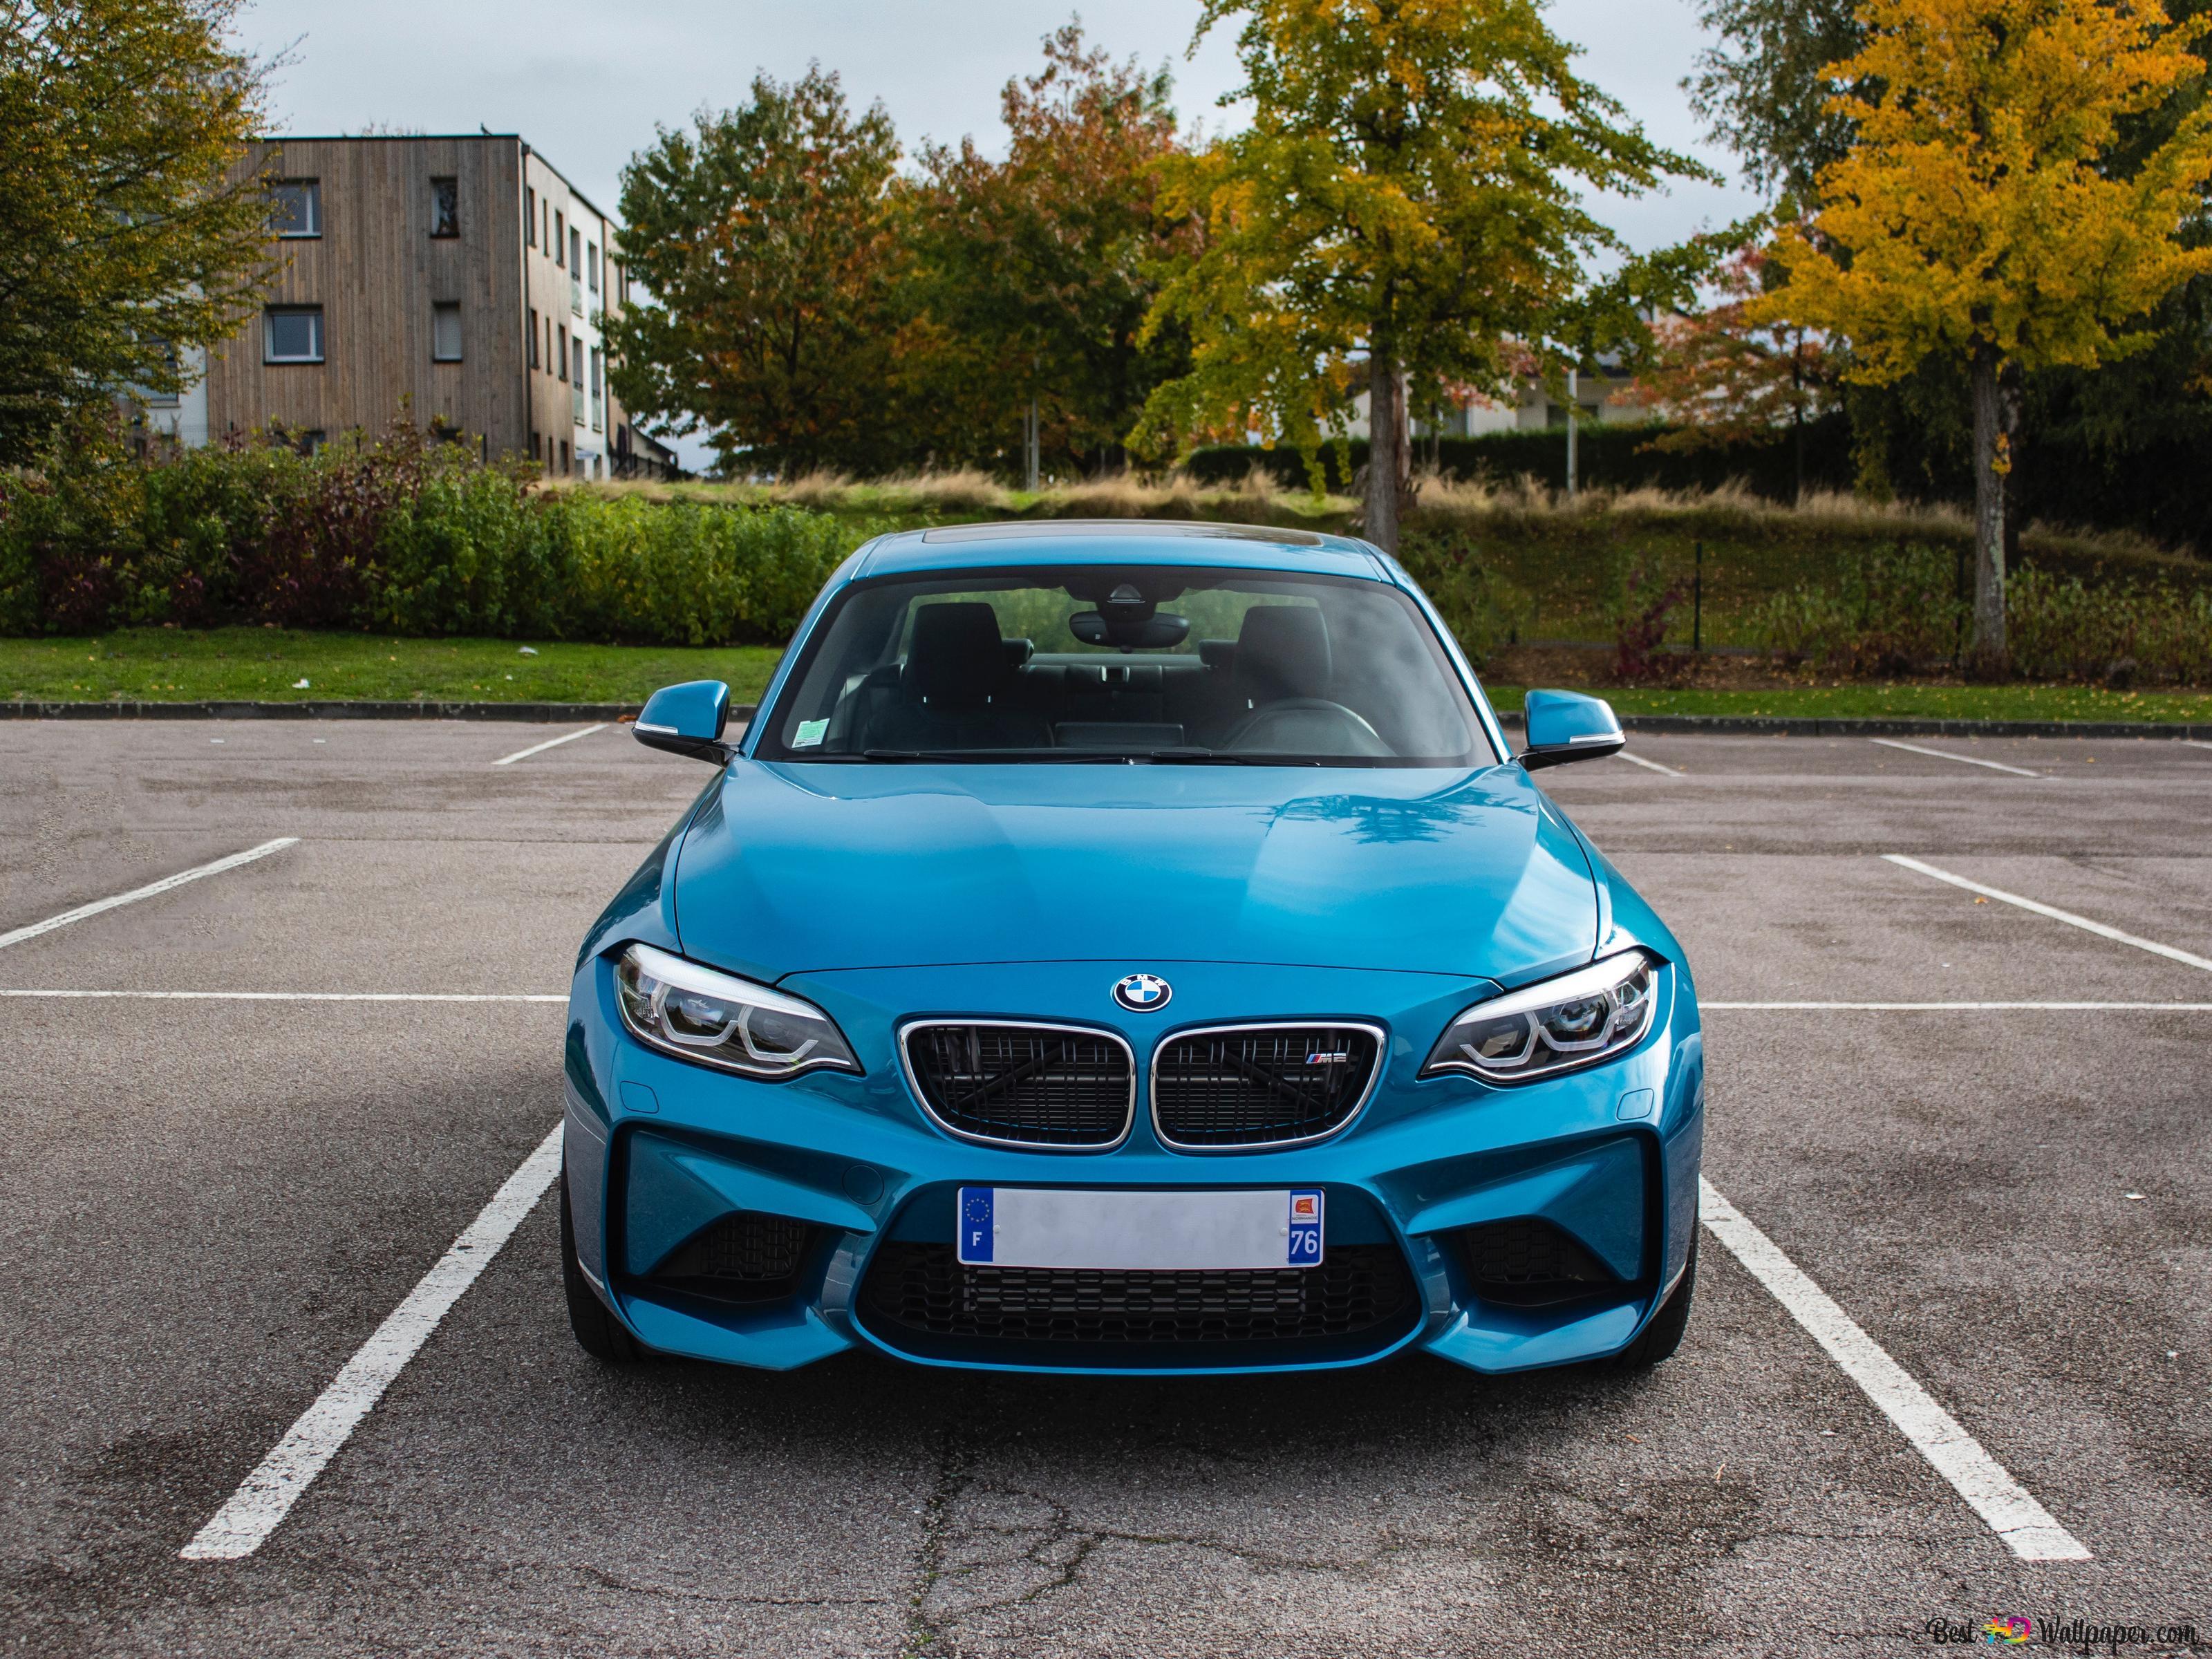 Blue Bmw Car Hd Wallpaper Download